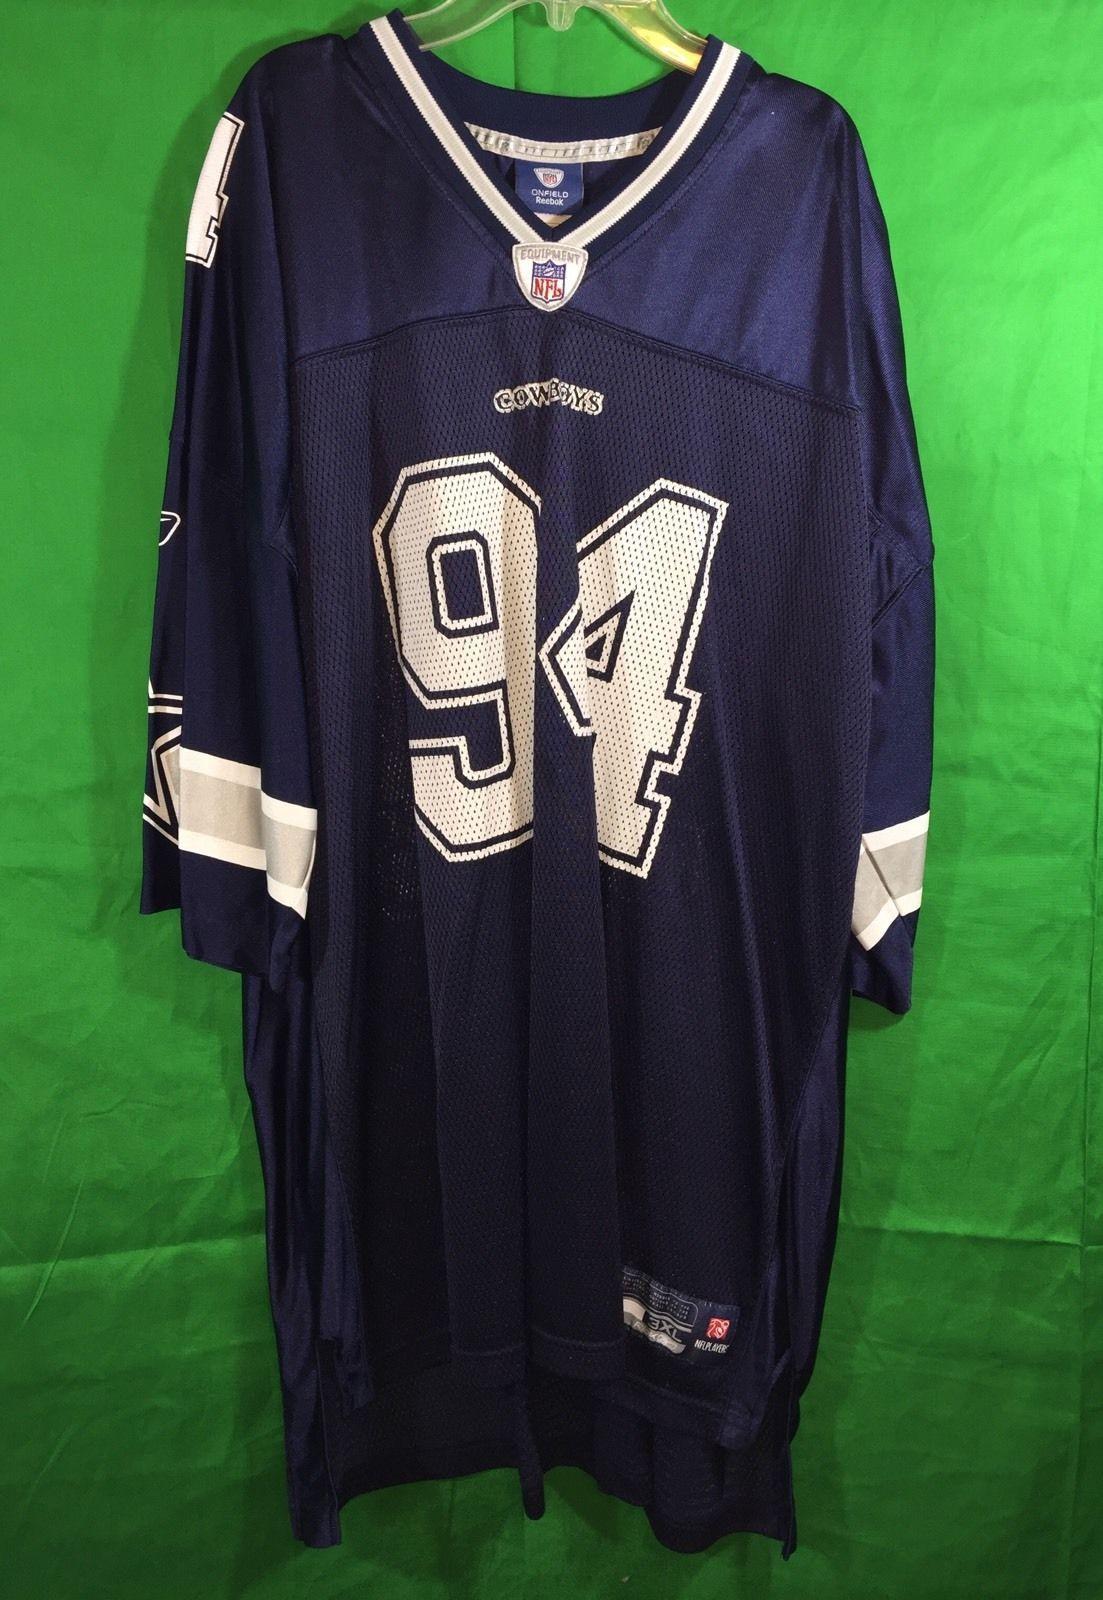 best authentic b8236 ffde2 NFL, Dallas Cowboys, DeMarcus Ware #94 Blue Reebok Jersey ...